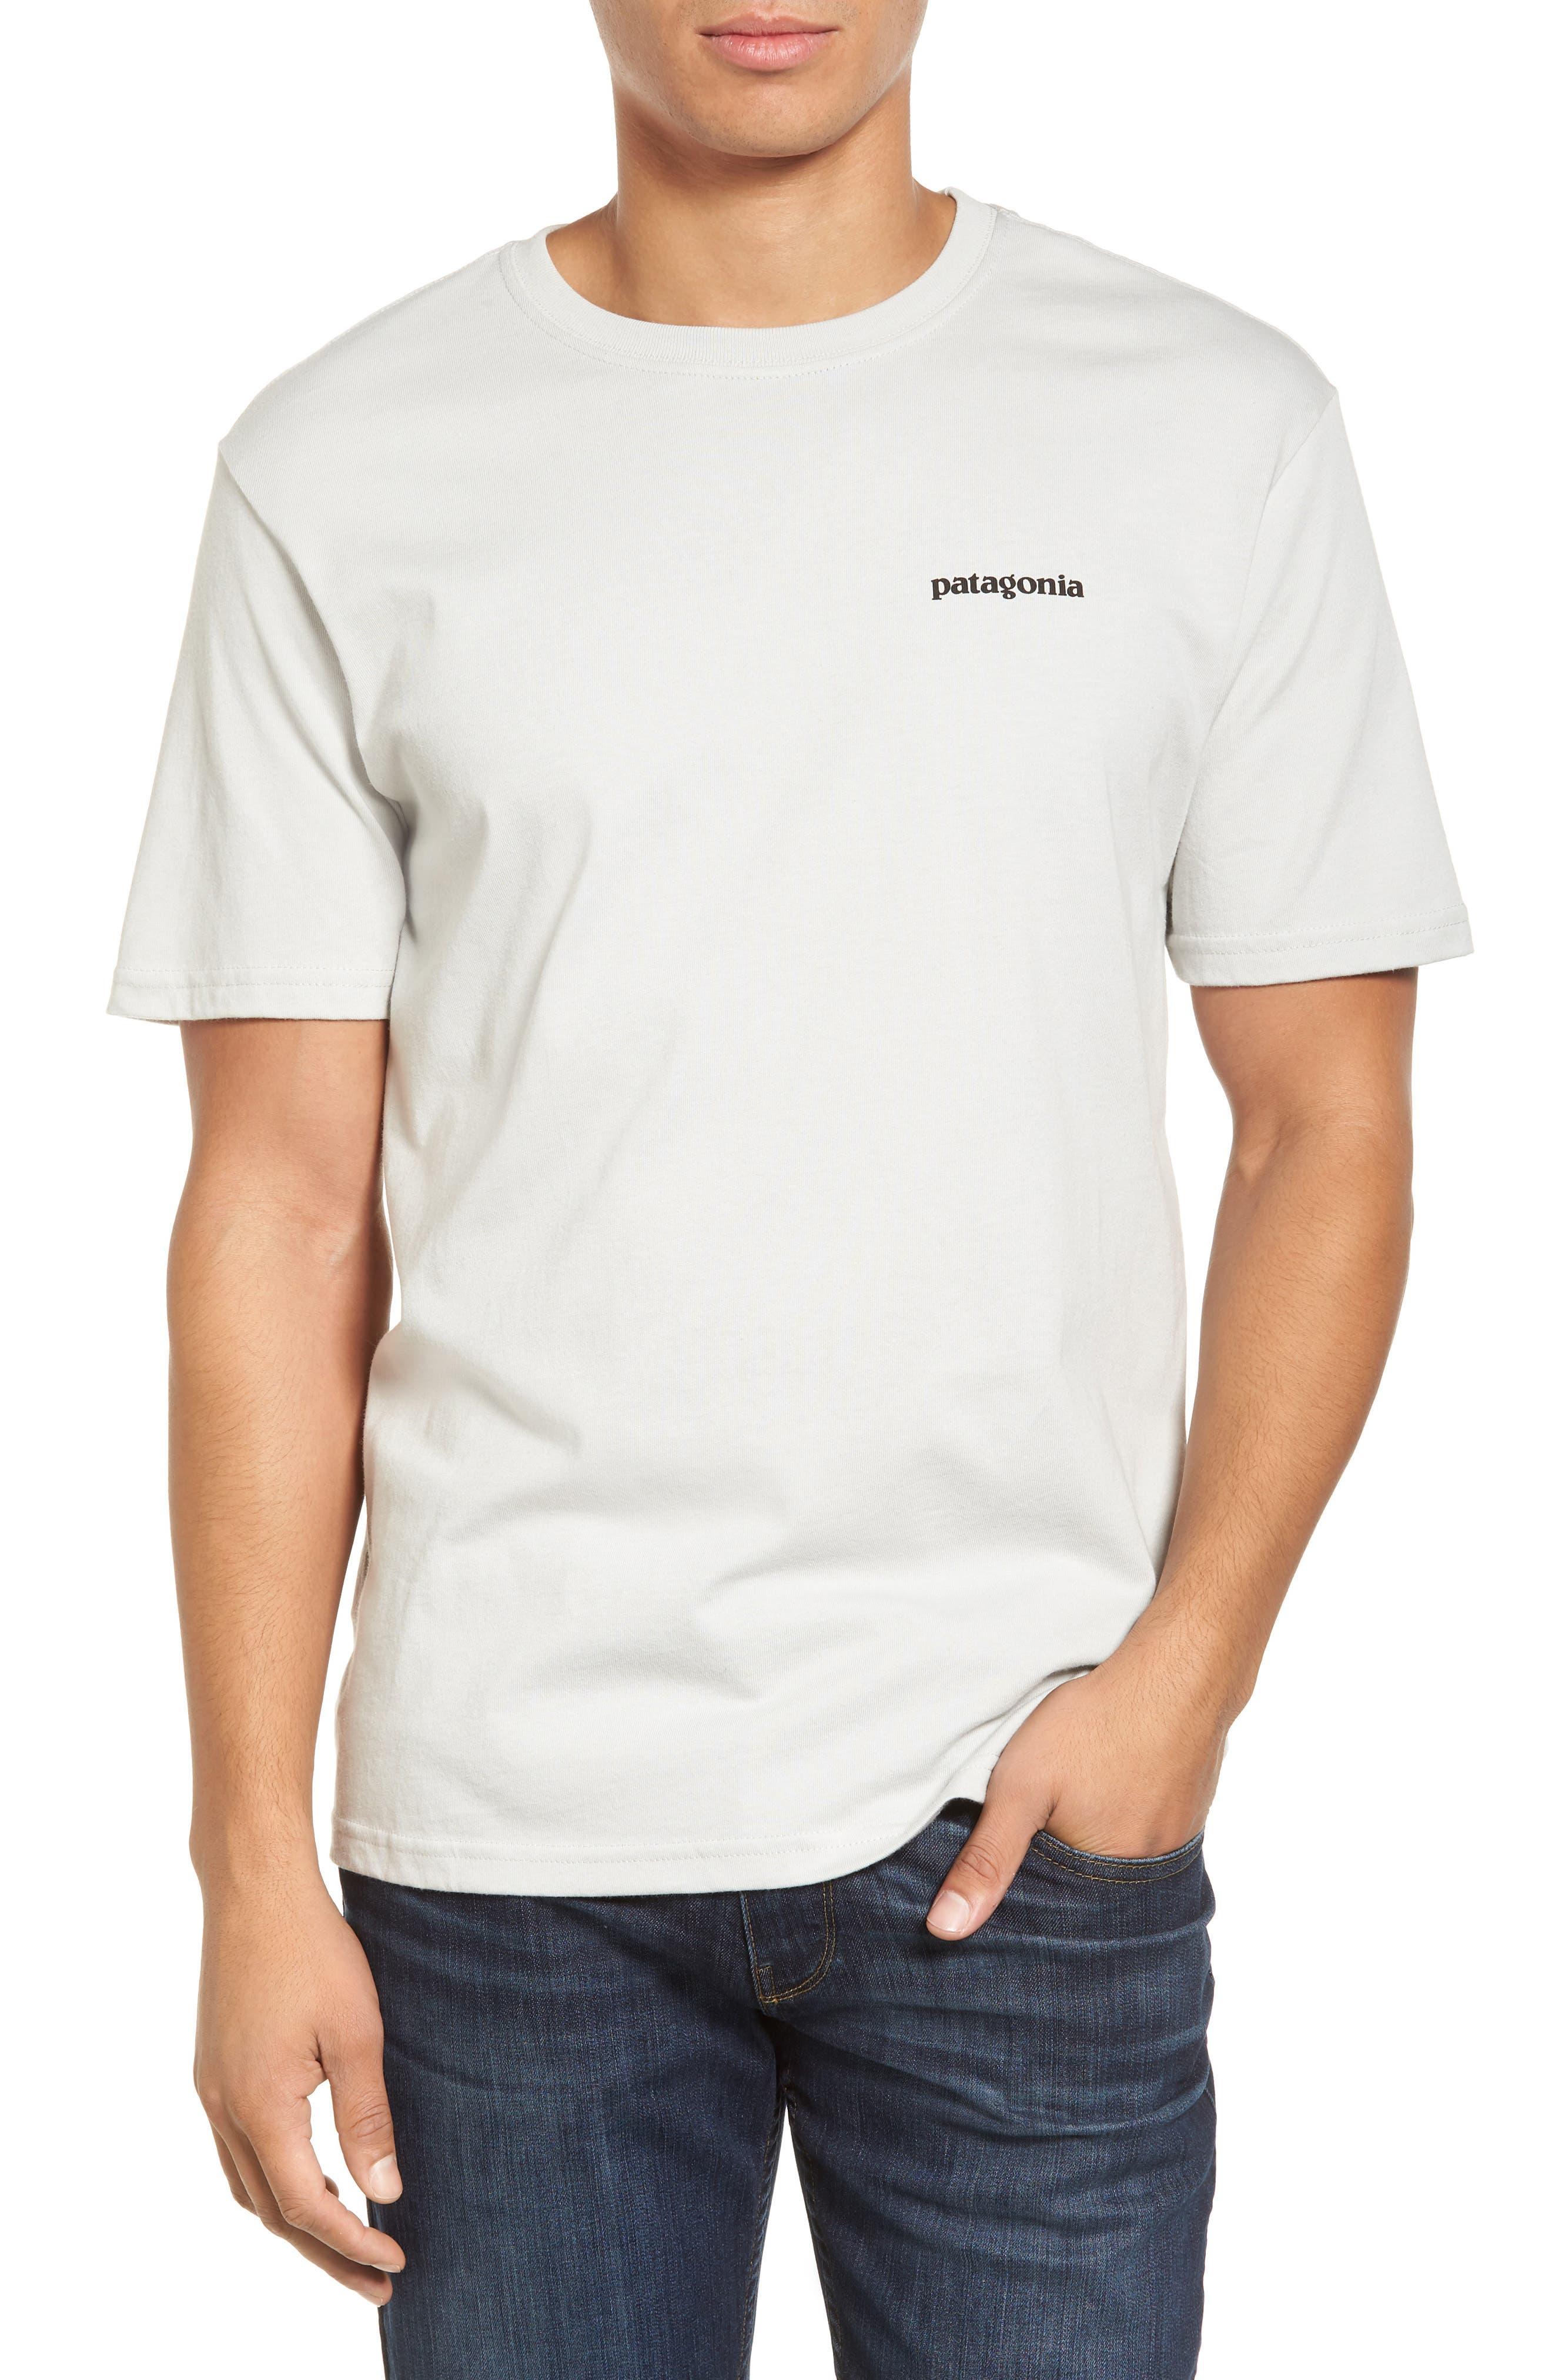 Main Image - Patagonia 'Trout Fitz Roy' Organic Cotton T-Shirt